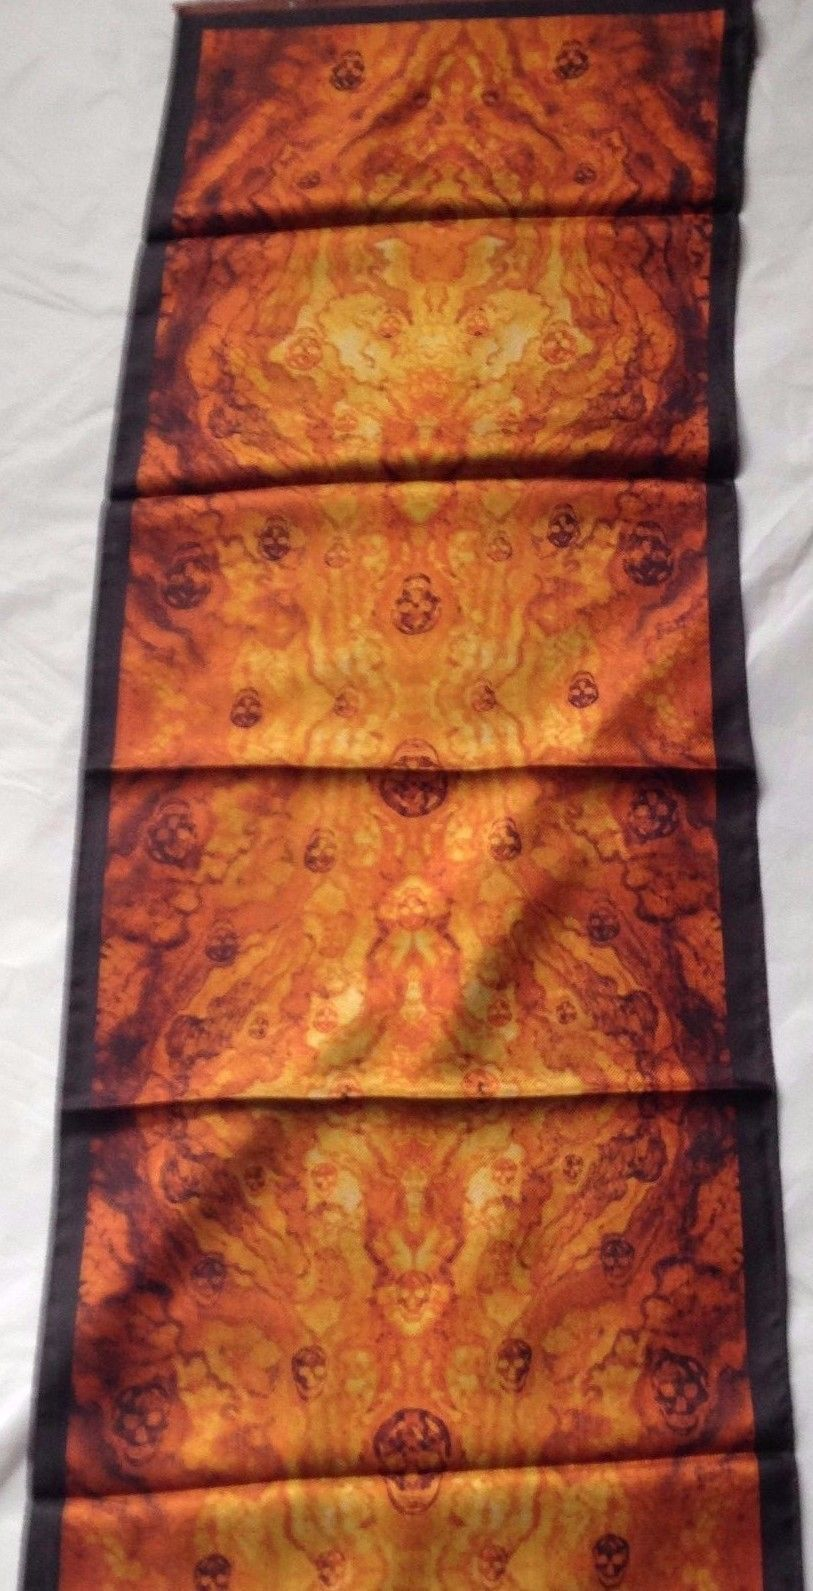 Alexander McQueen Inferno Flaming Skulls Silk Scarf - Orange and Black